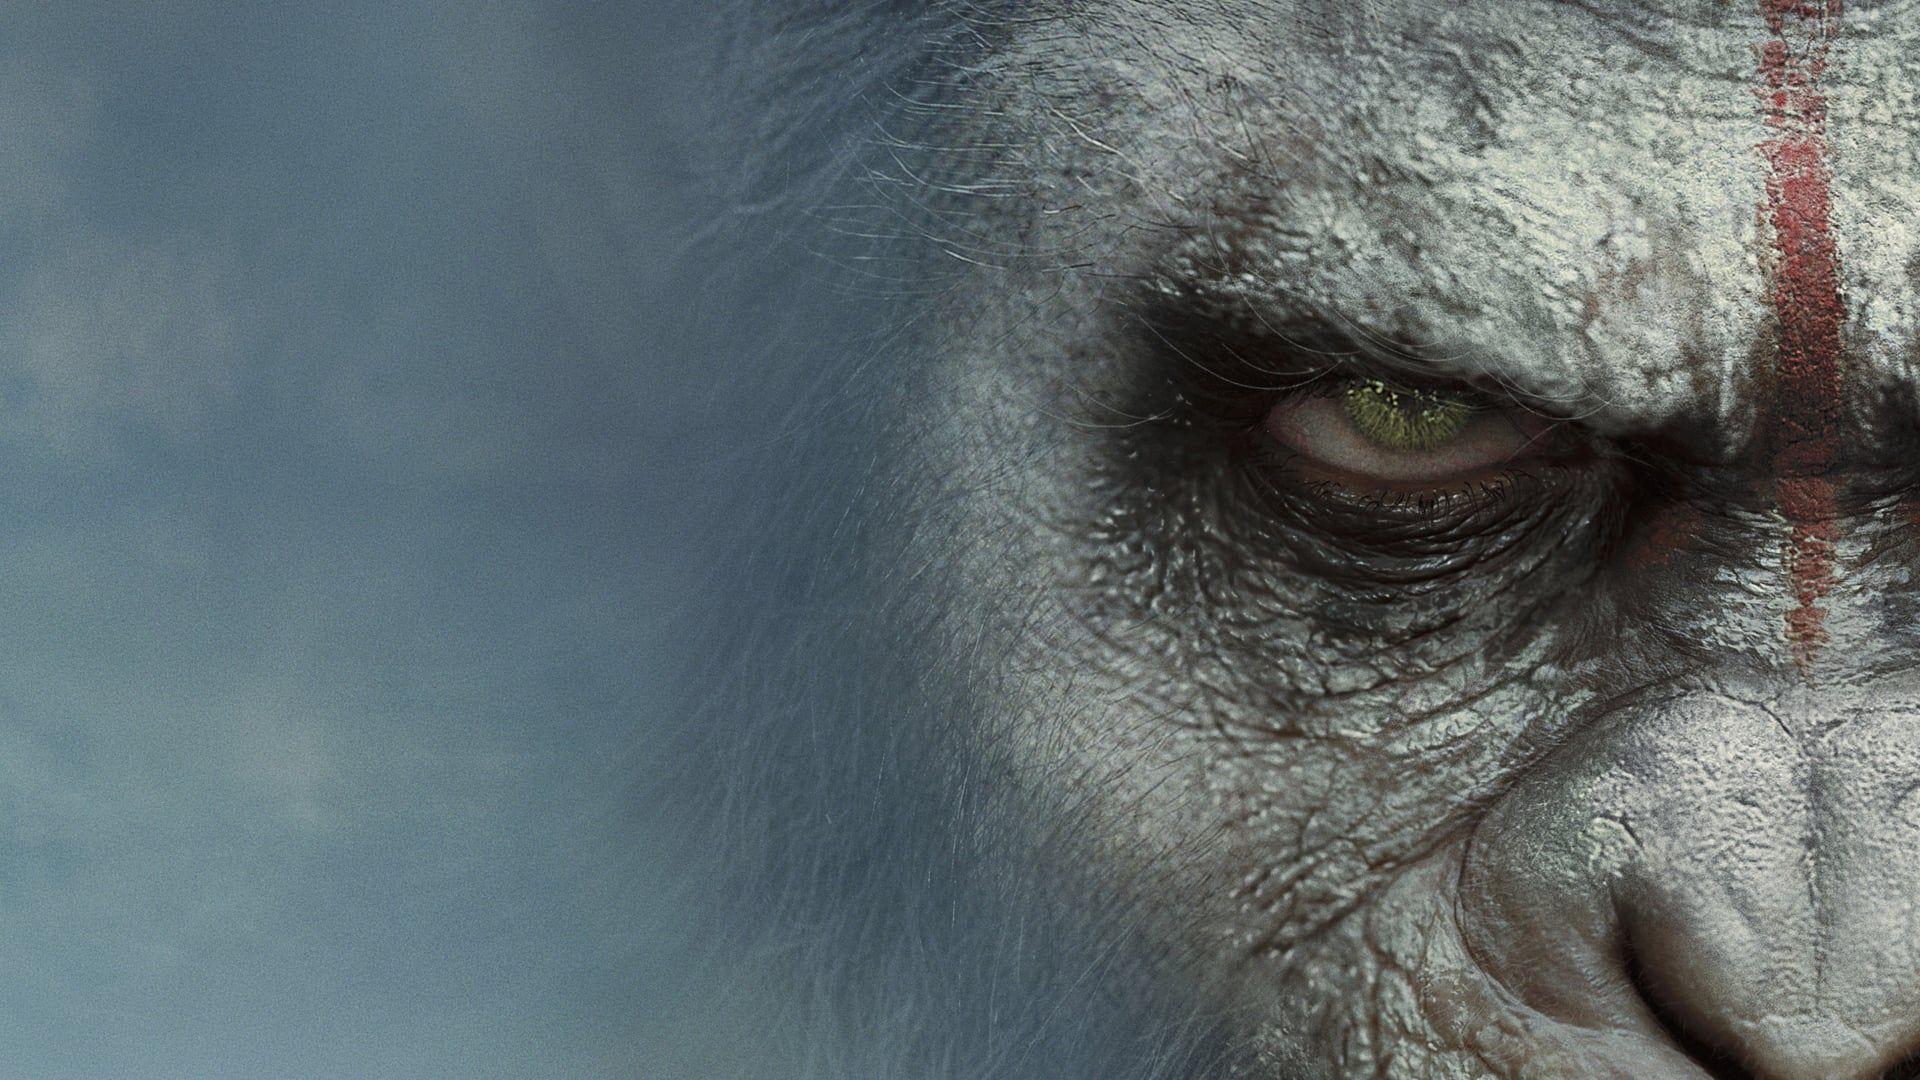 A Majmok Bolygoja Forradalom 2014 Online Teljes Film Filmek Magyarul Letoltes Hd A Majmok Bolygoja Forra Pianeta Delle Scimmie Film Online Guardare Film